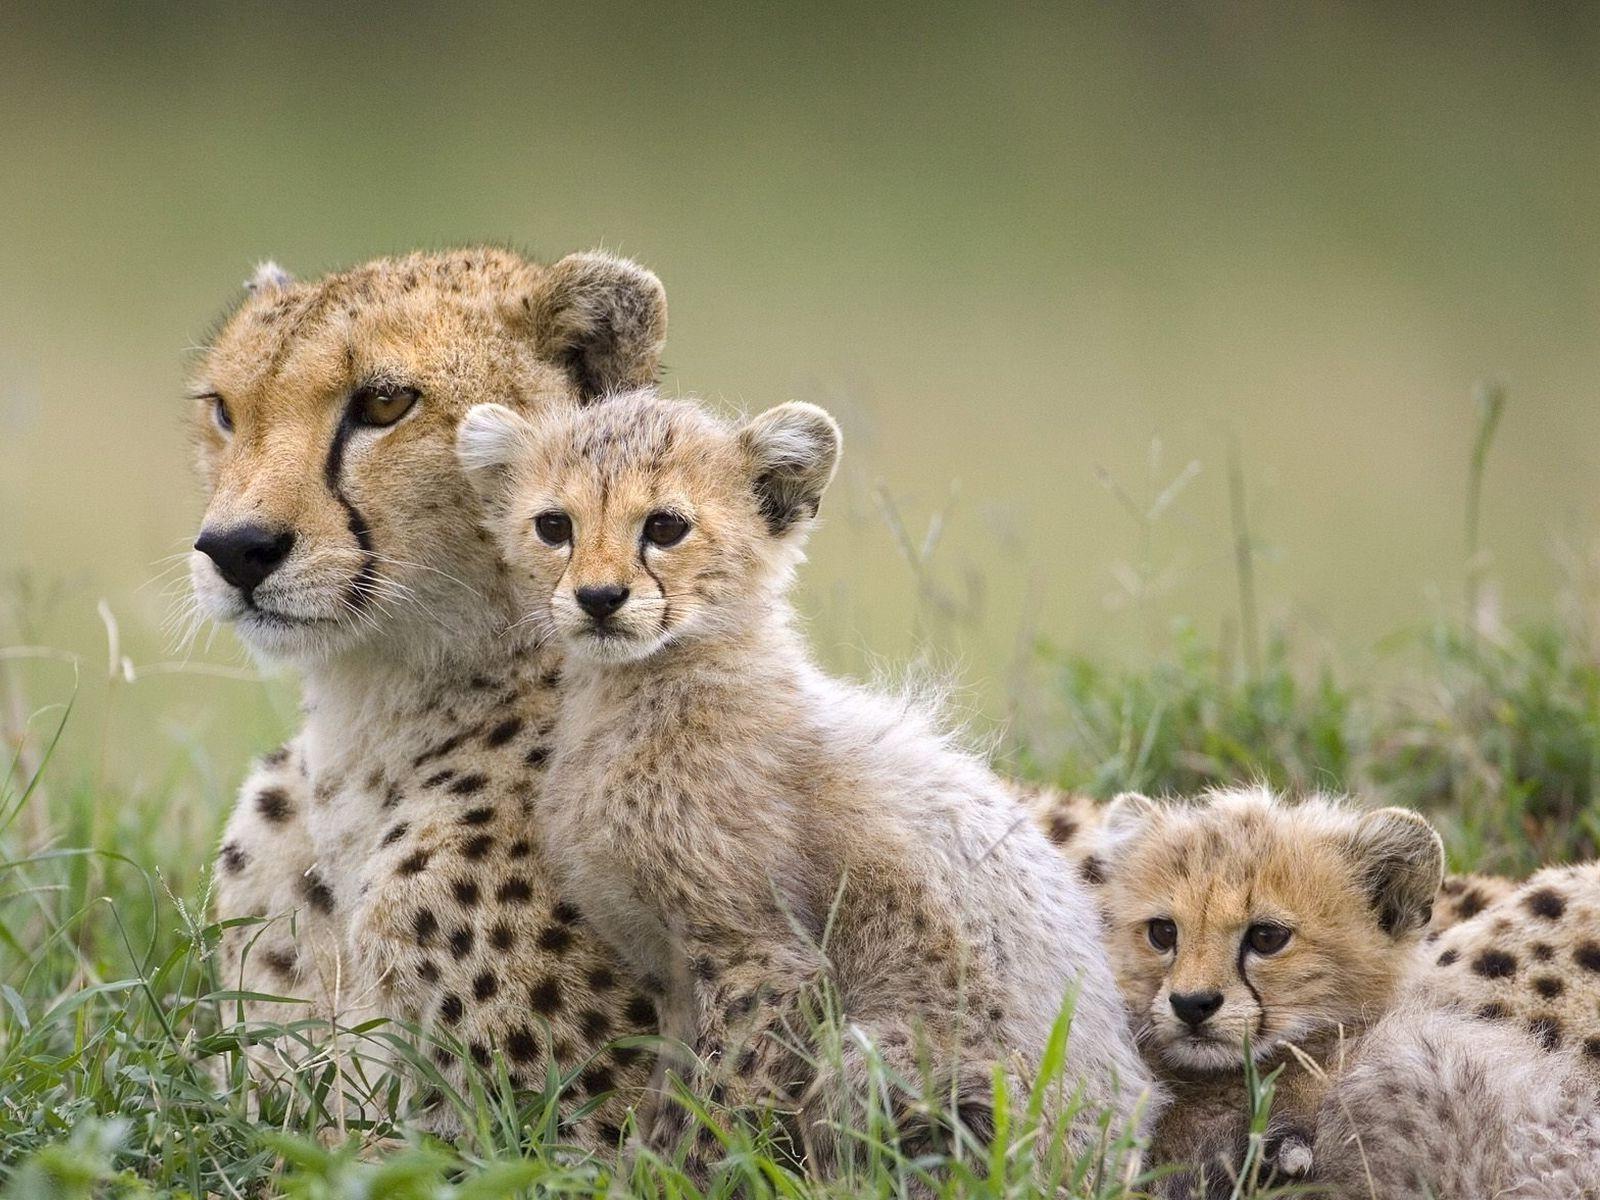 Fondos De Pantalla De Animales Bebes: Fondos De Pantalla : Animales, Fauna Silvestre, Animales